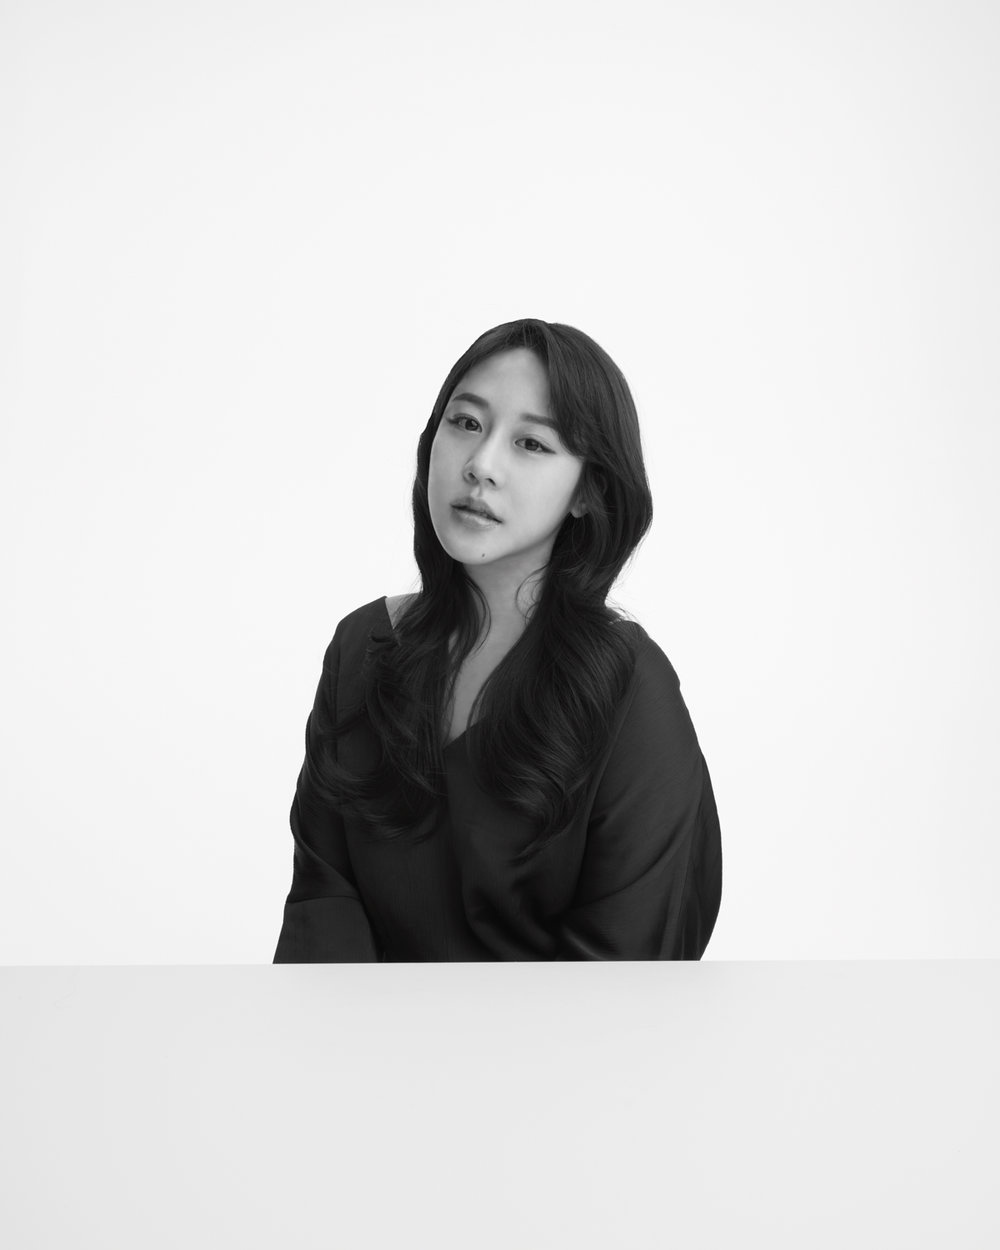 SUNGHEE_YOON_029.jpg